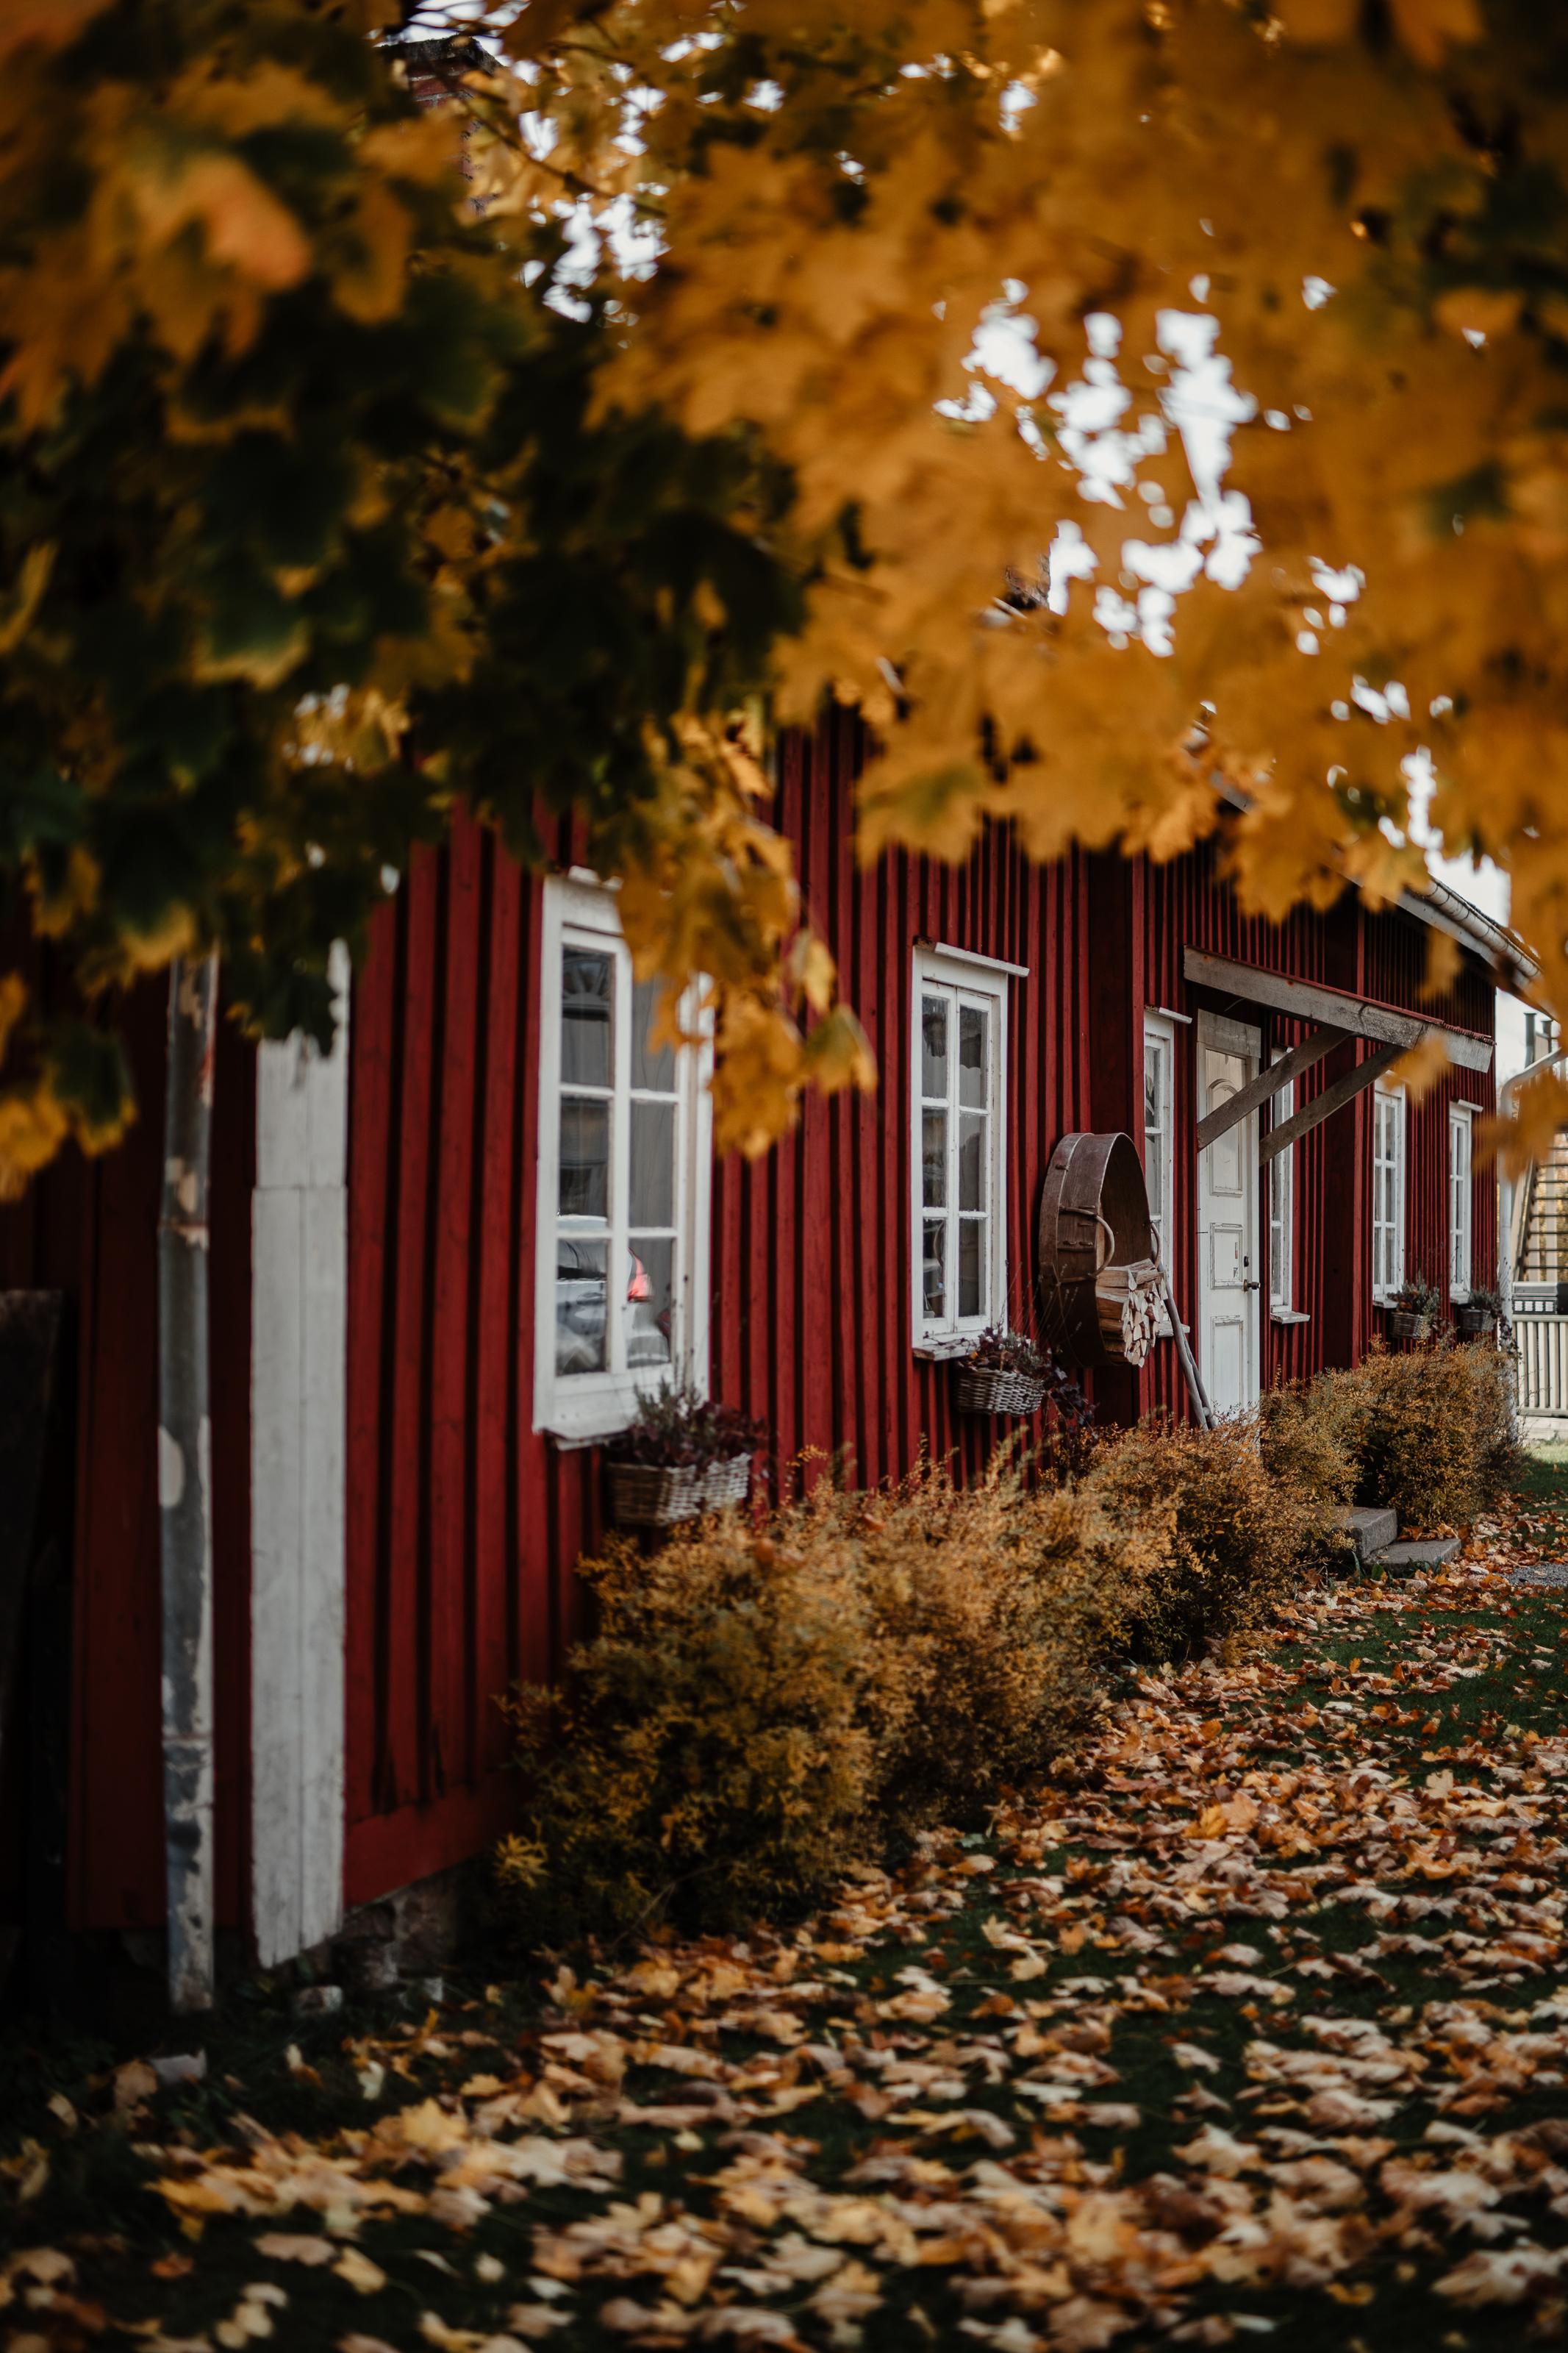 Bröllopsfotograf-Uddetorp Säteri-Höstbröllop-Fotograf Emilia- Bröllopsfotograf Borås-1.jpg